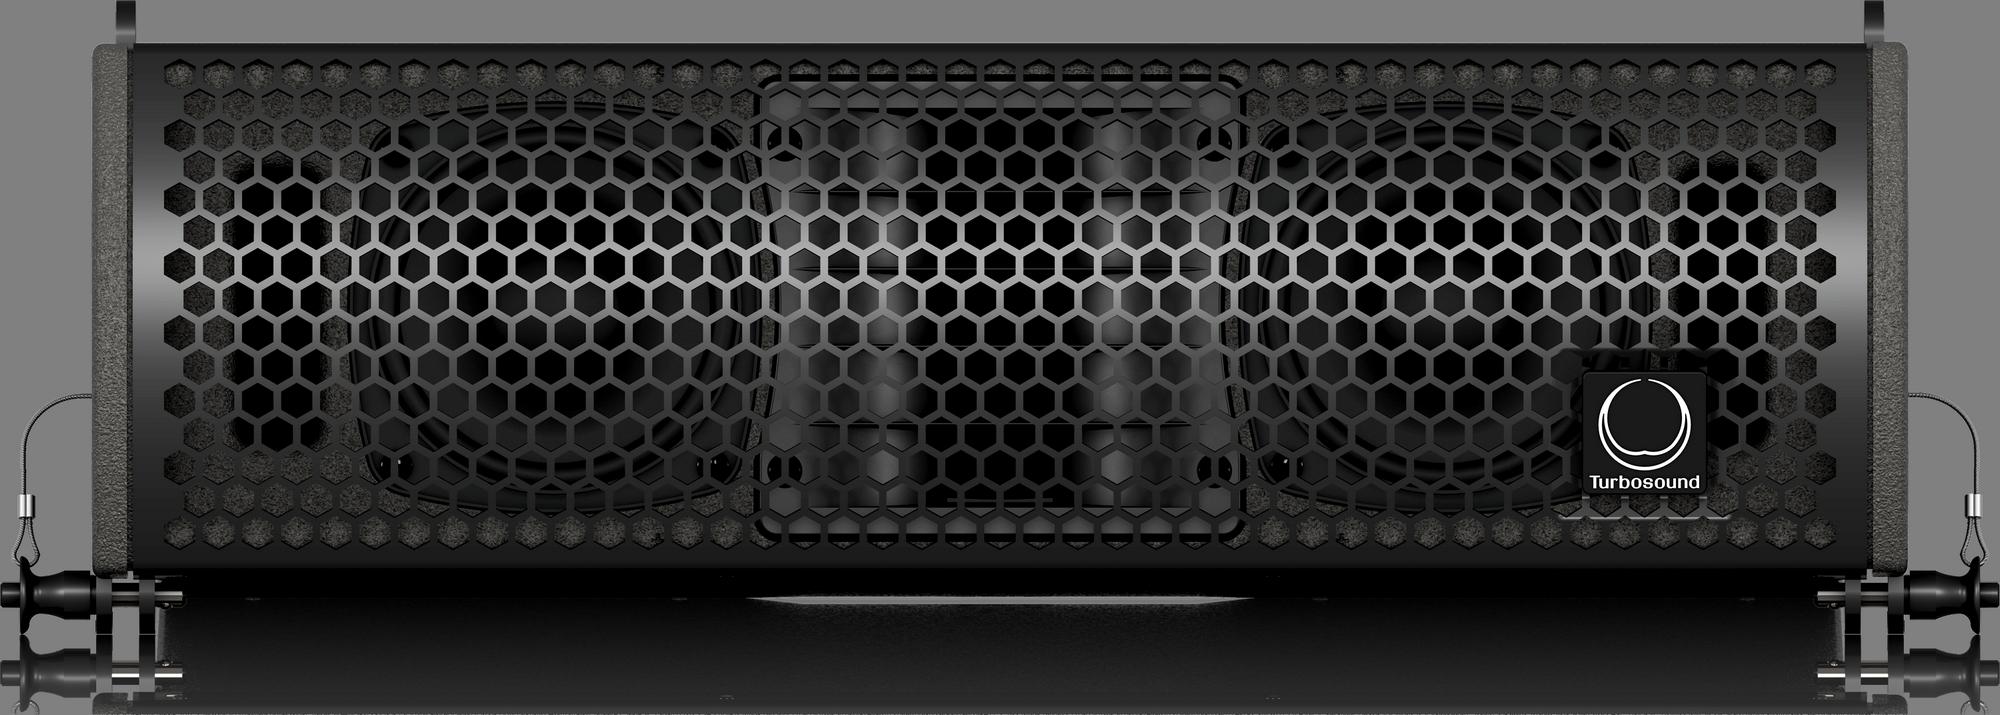 Turbosound  TLX43